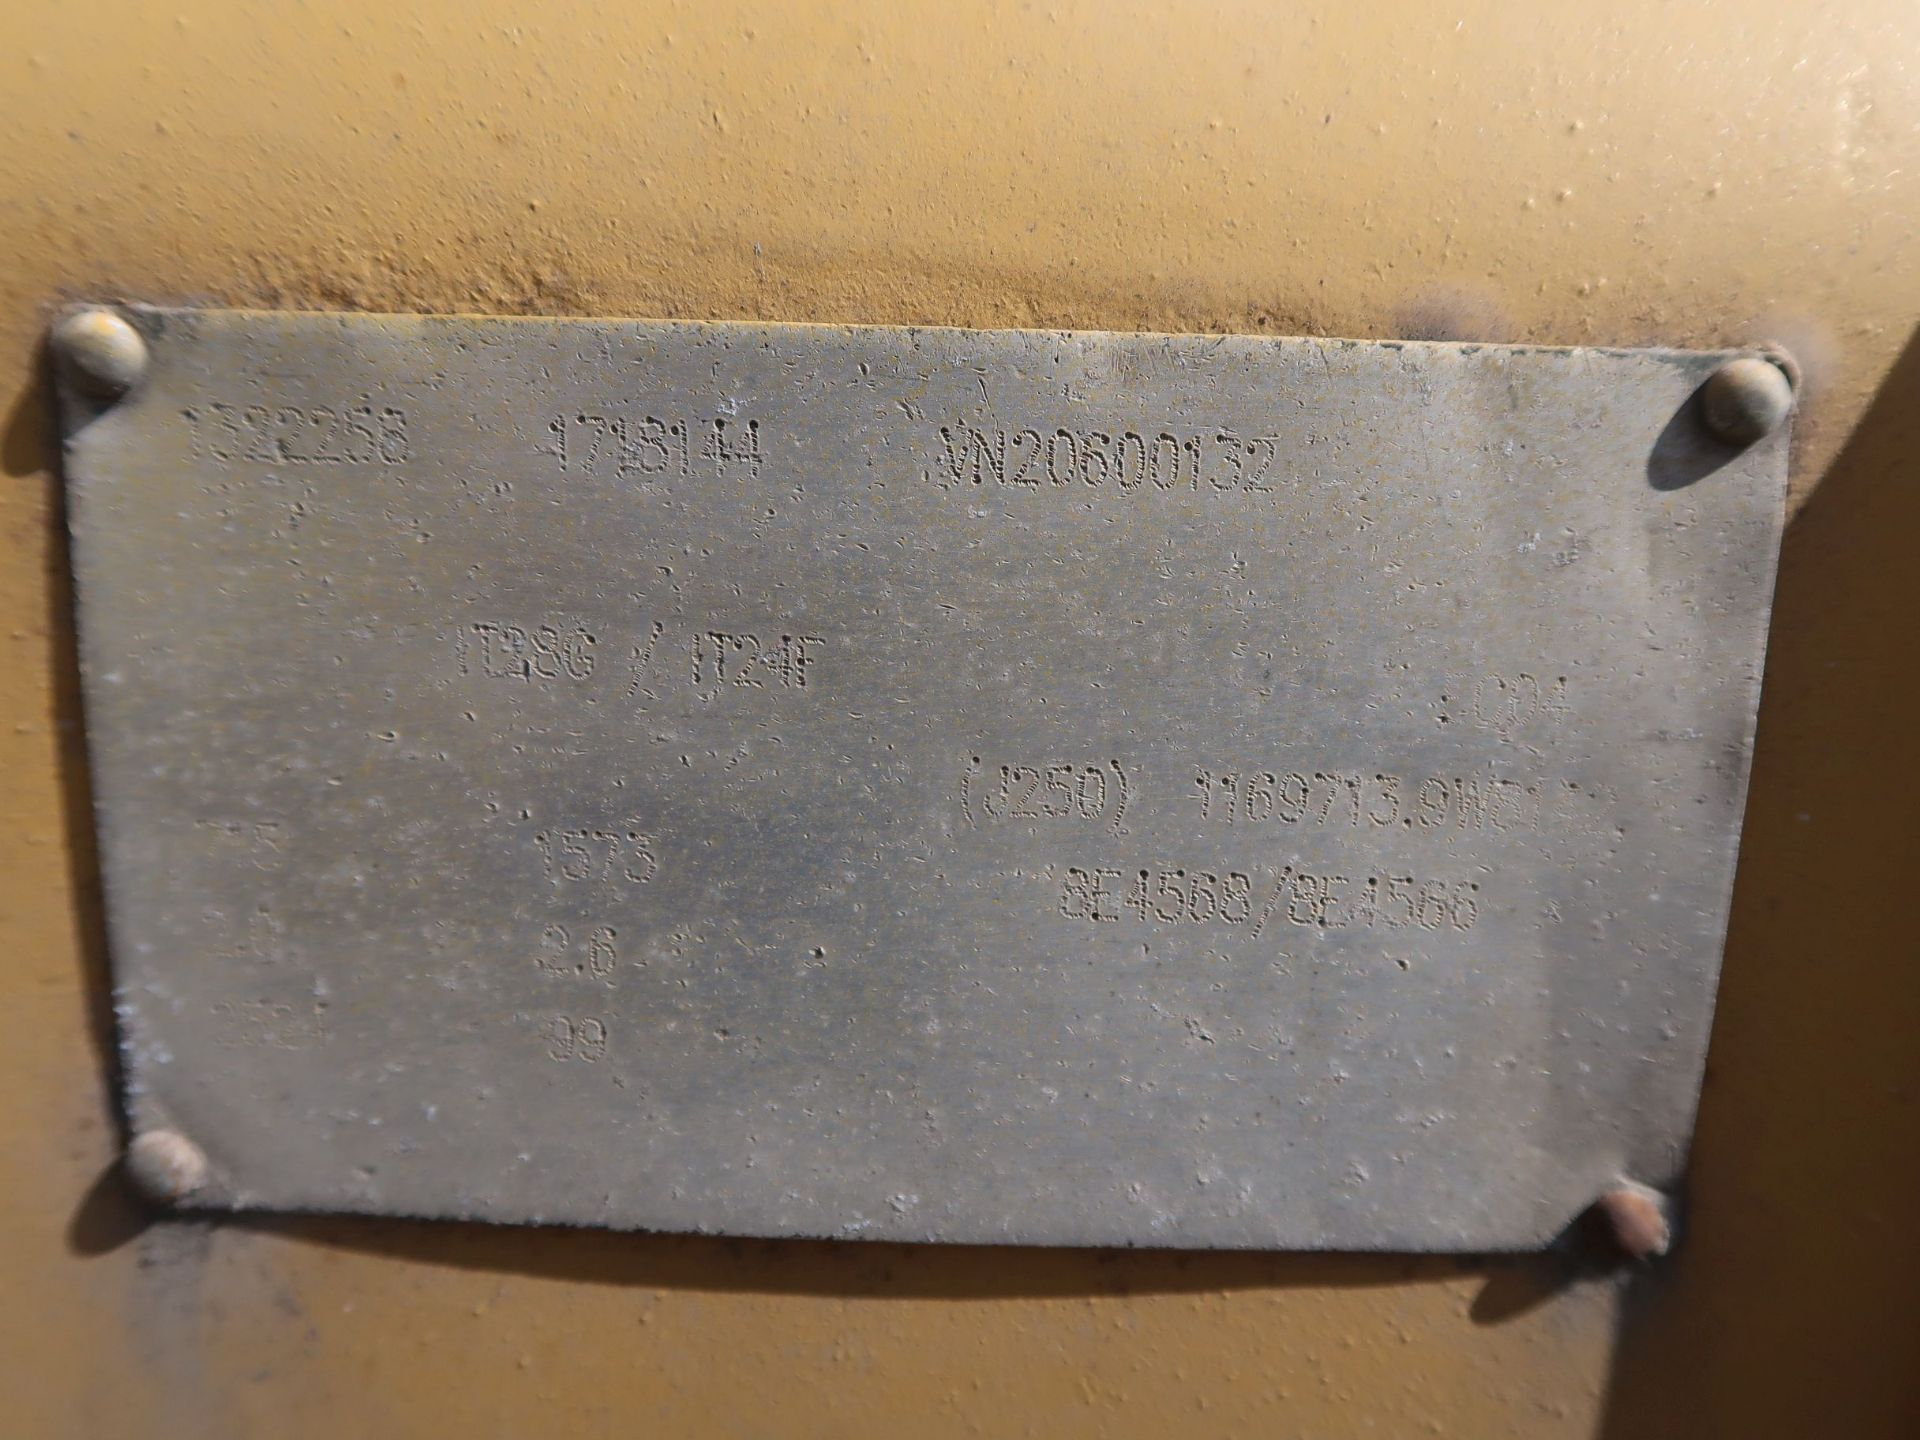 "Lot 1048 - 99"" CATERPILLAR IT28G/ IT24F BUCKET"